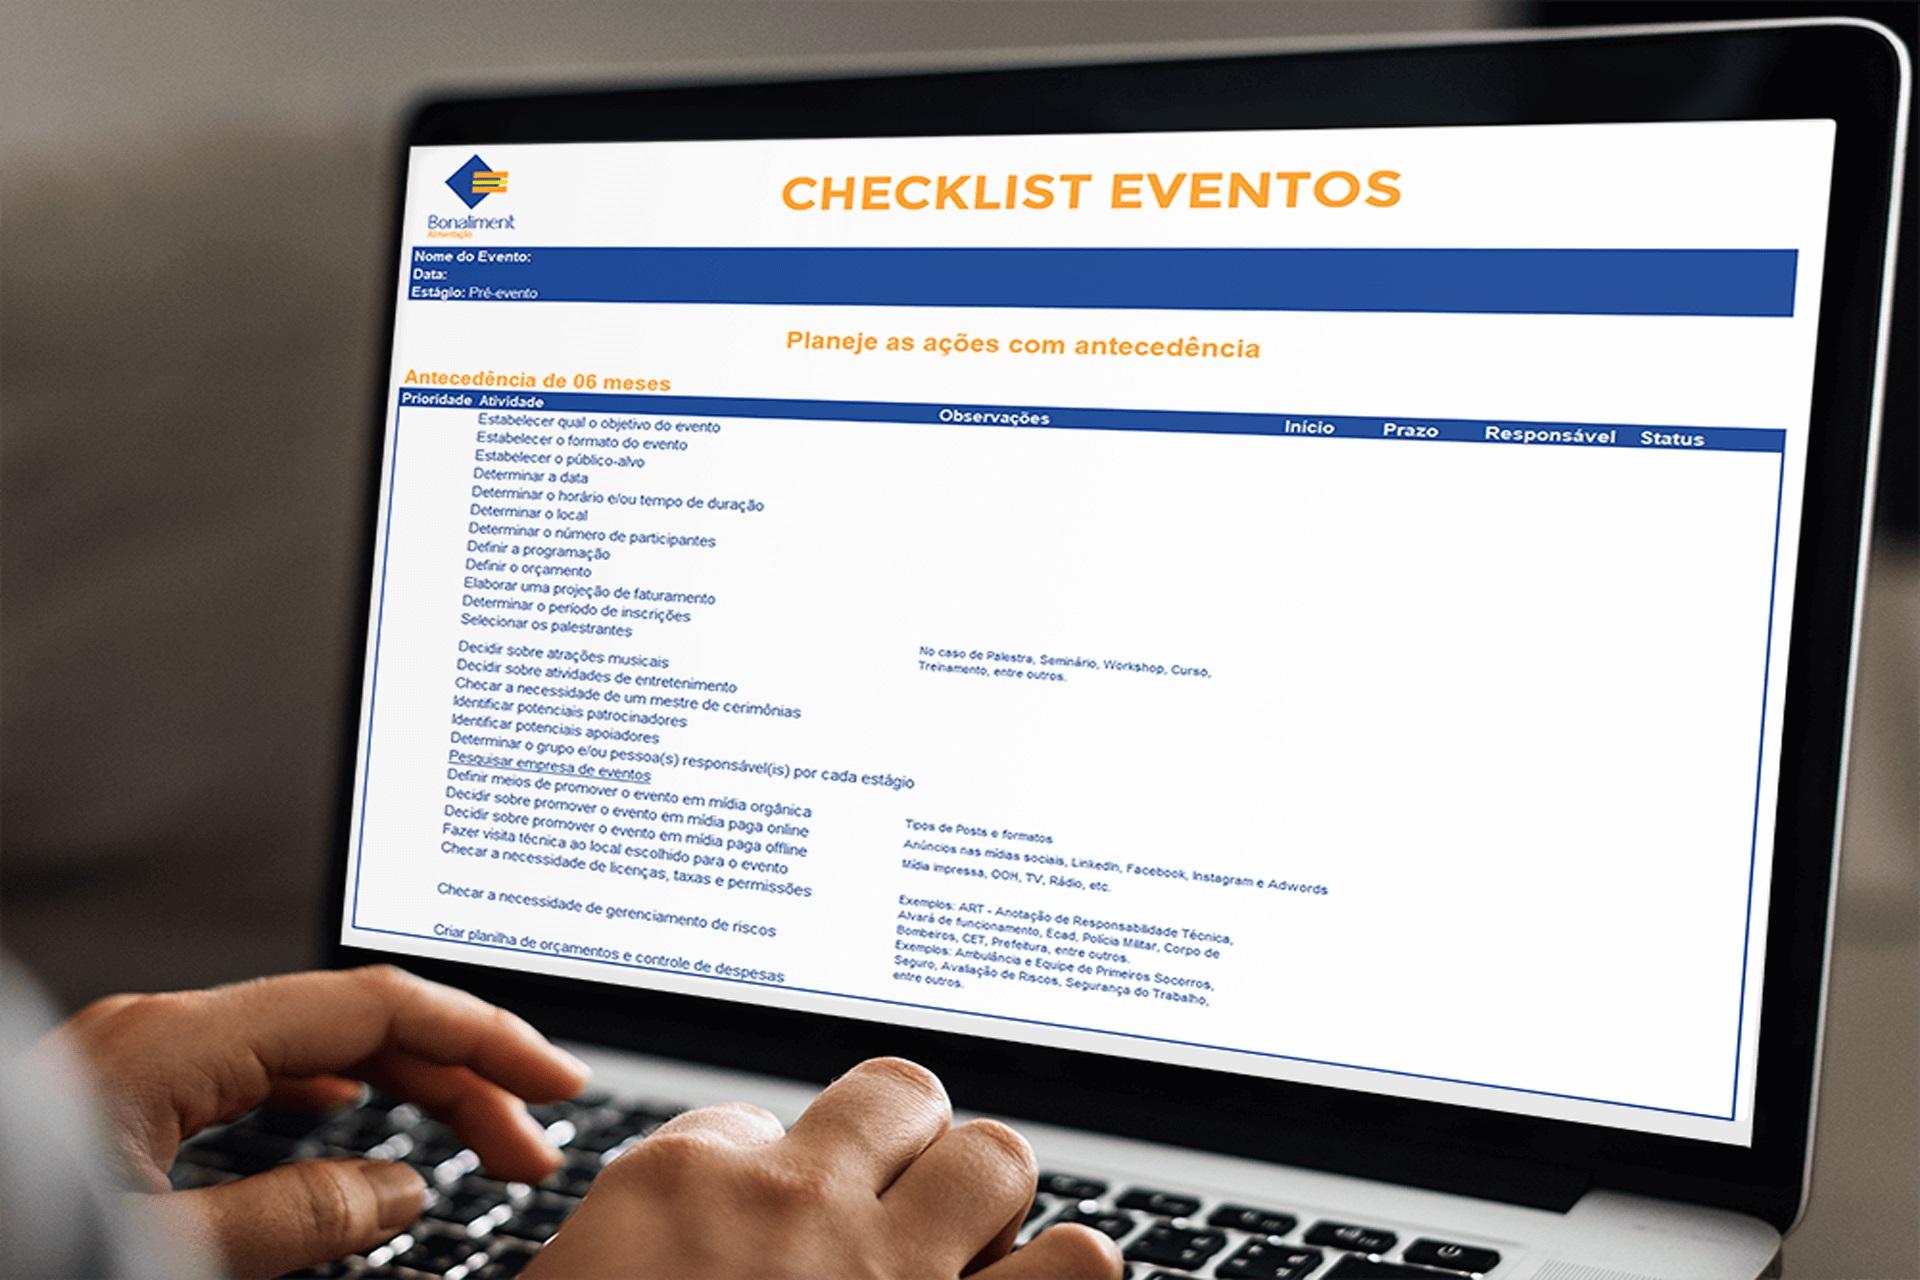 Bonaliment - Checklist de Eventos Corporativos